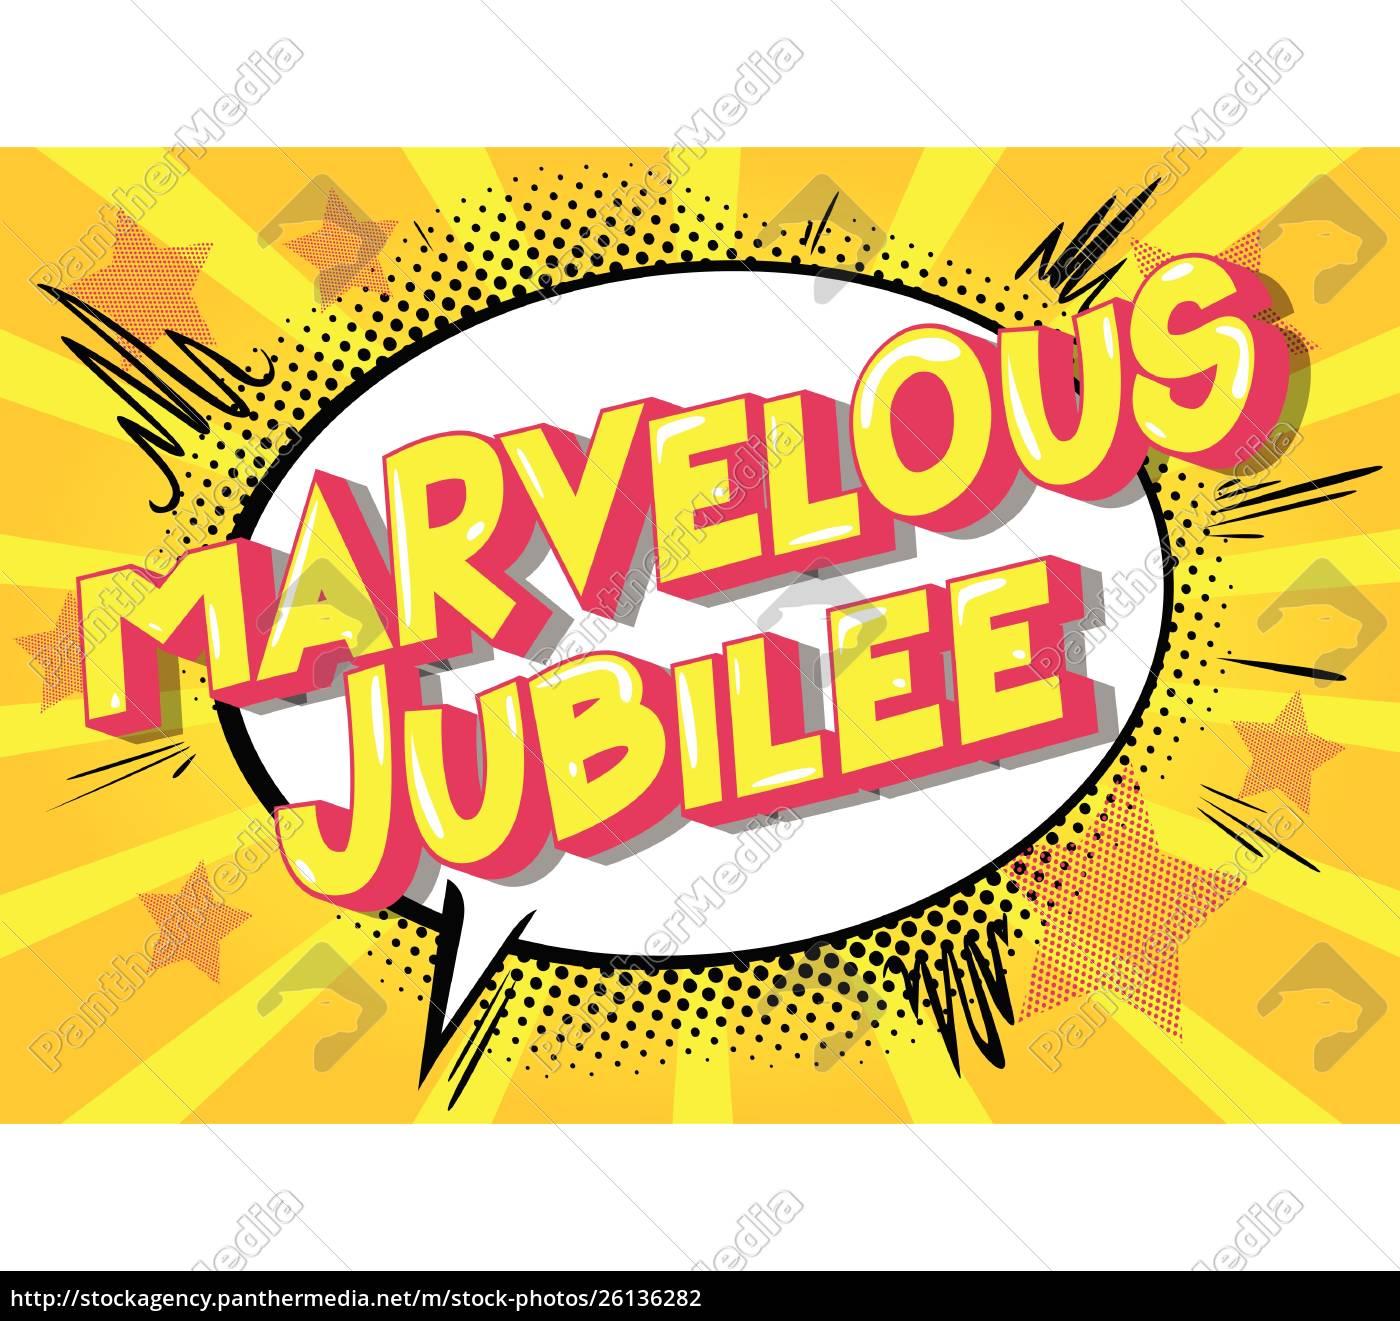 marvelous, jubilee, -, comic, book, style - 26136282